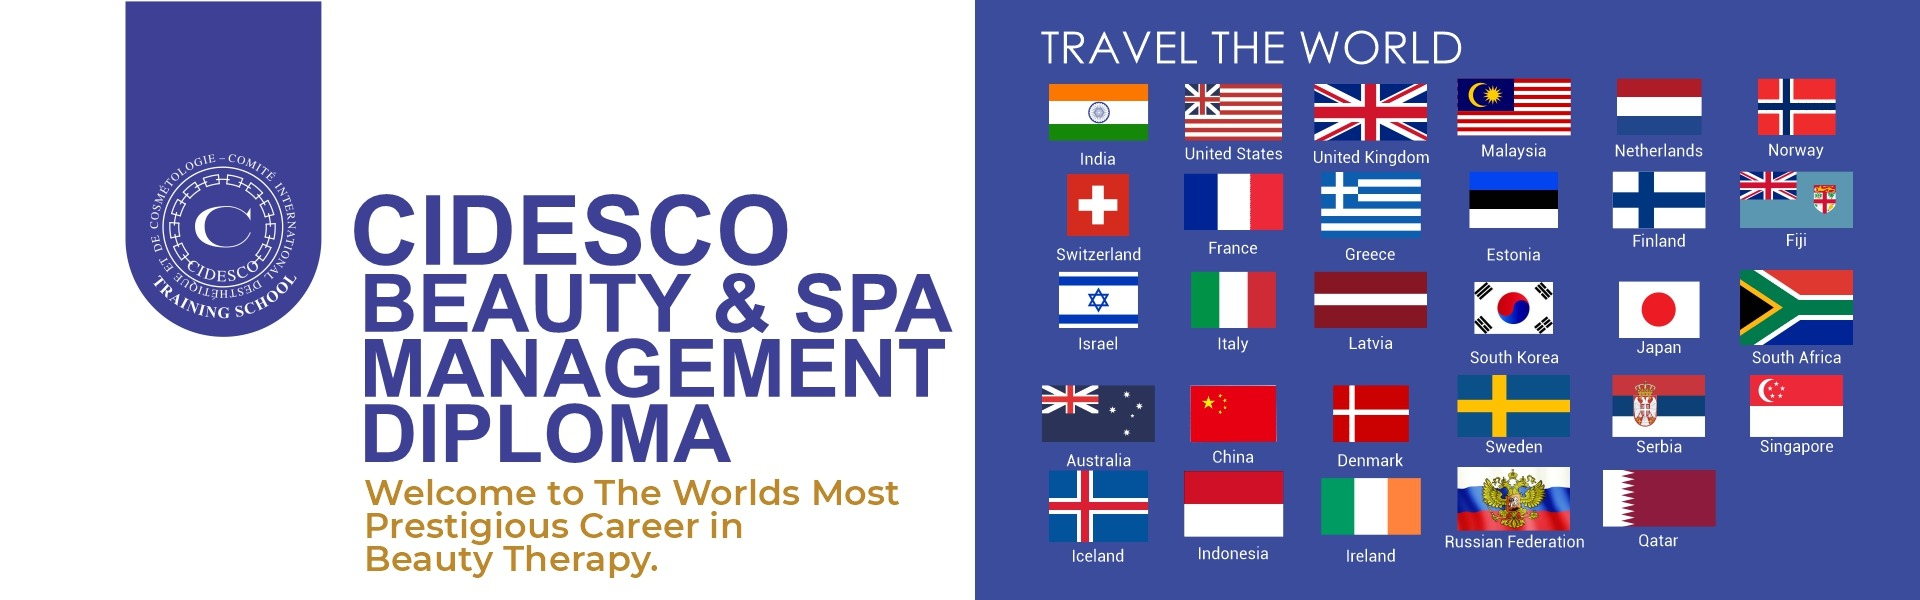 CIDESCO Beauty & Spa Management Diploma